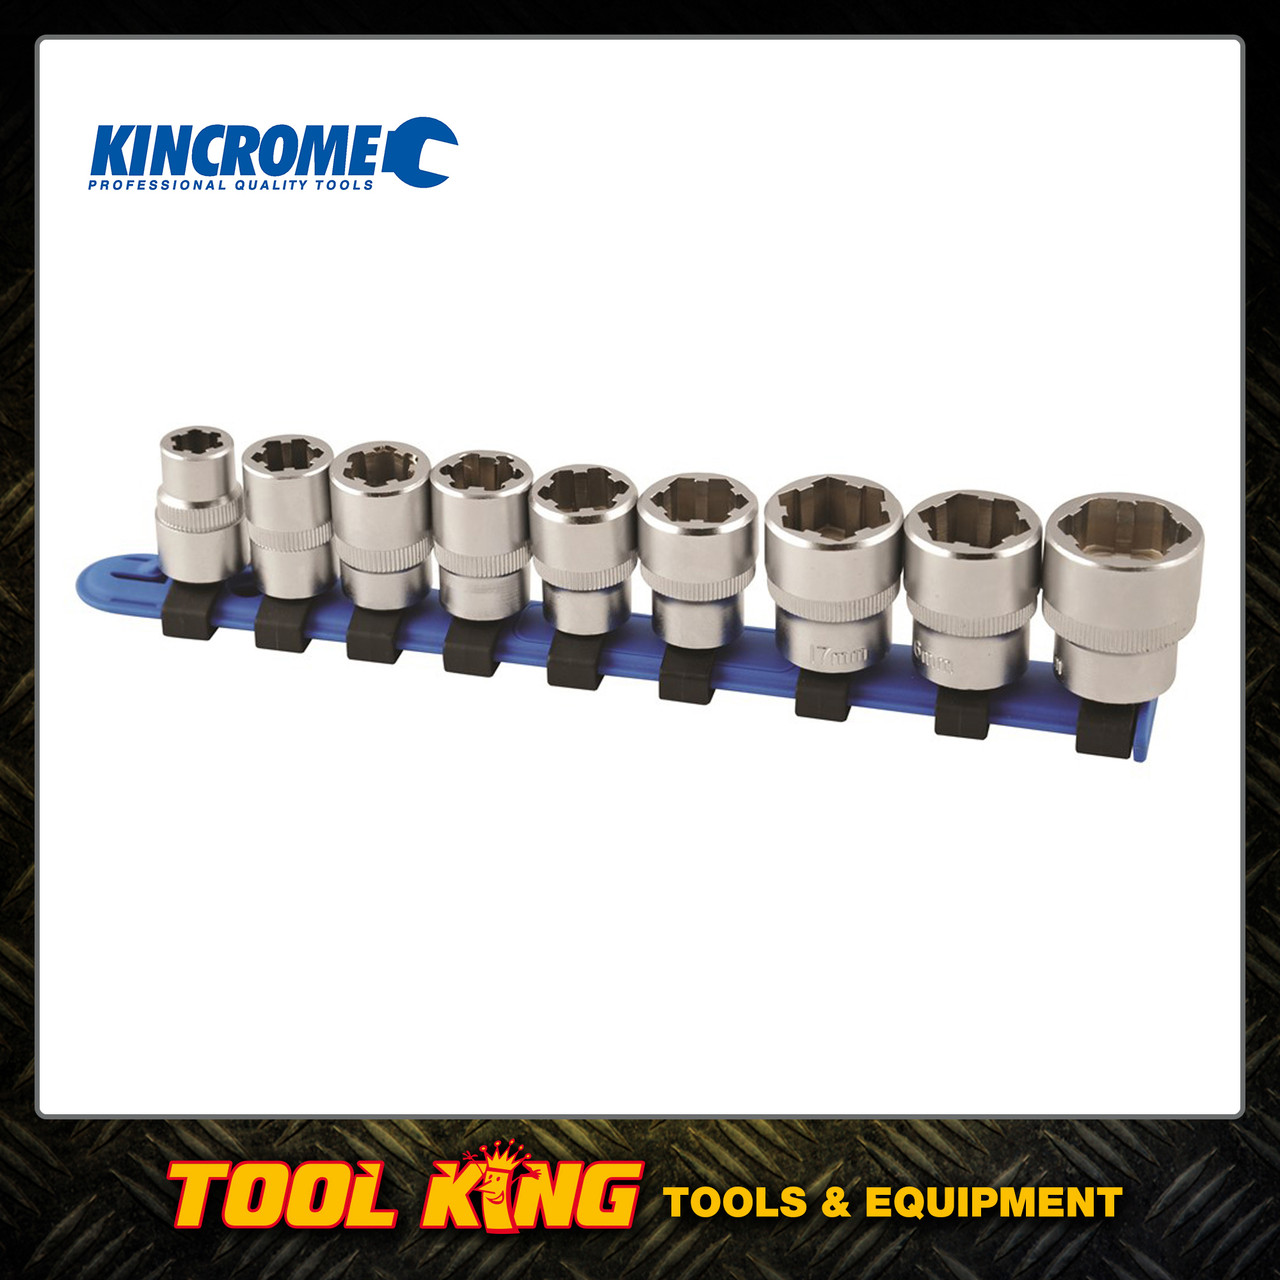 9pc Damaged Bolt extractor socket set Kincrome